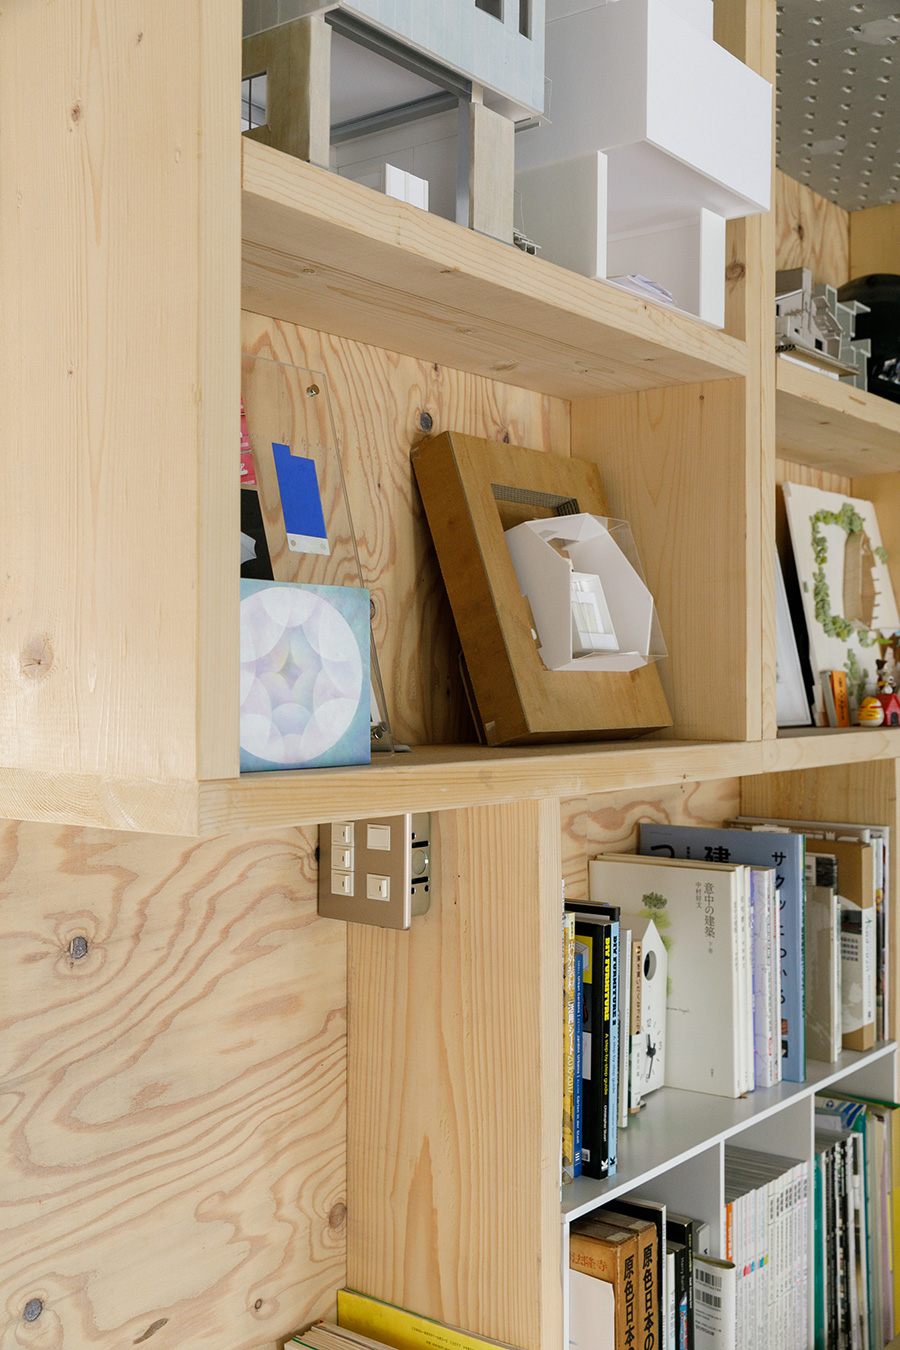 H型のユニットを縦横変えて組み合わせることで、多様な表情を持たせた棚。建築の模型や友人作家のアートが並ぶ。